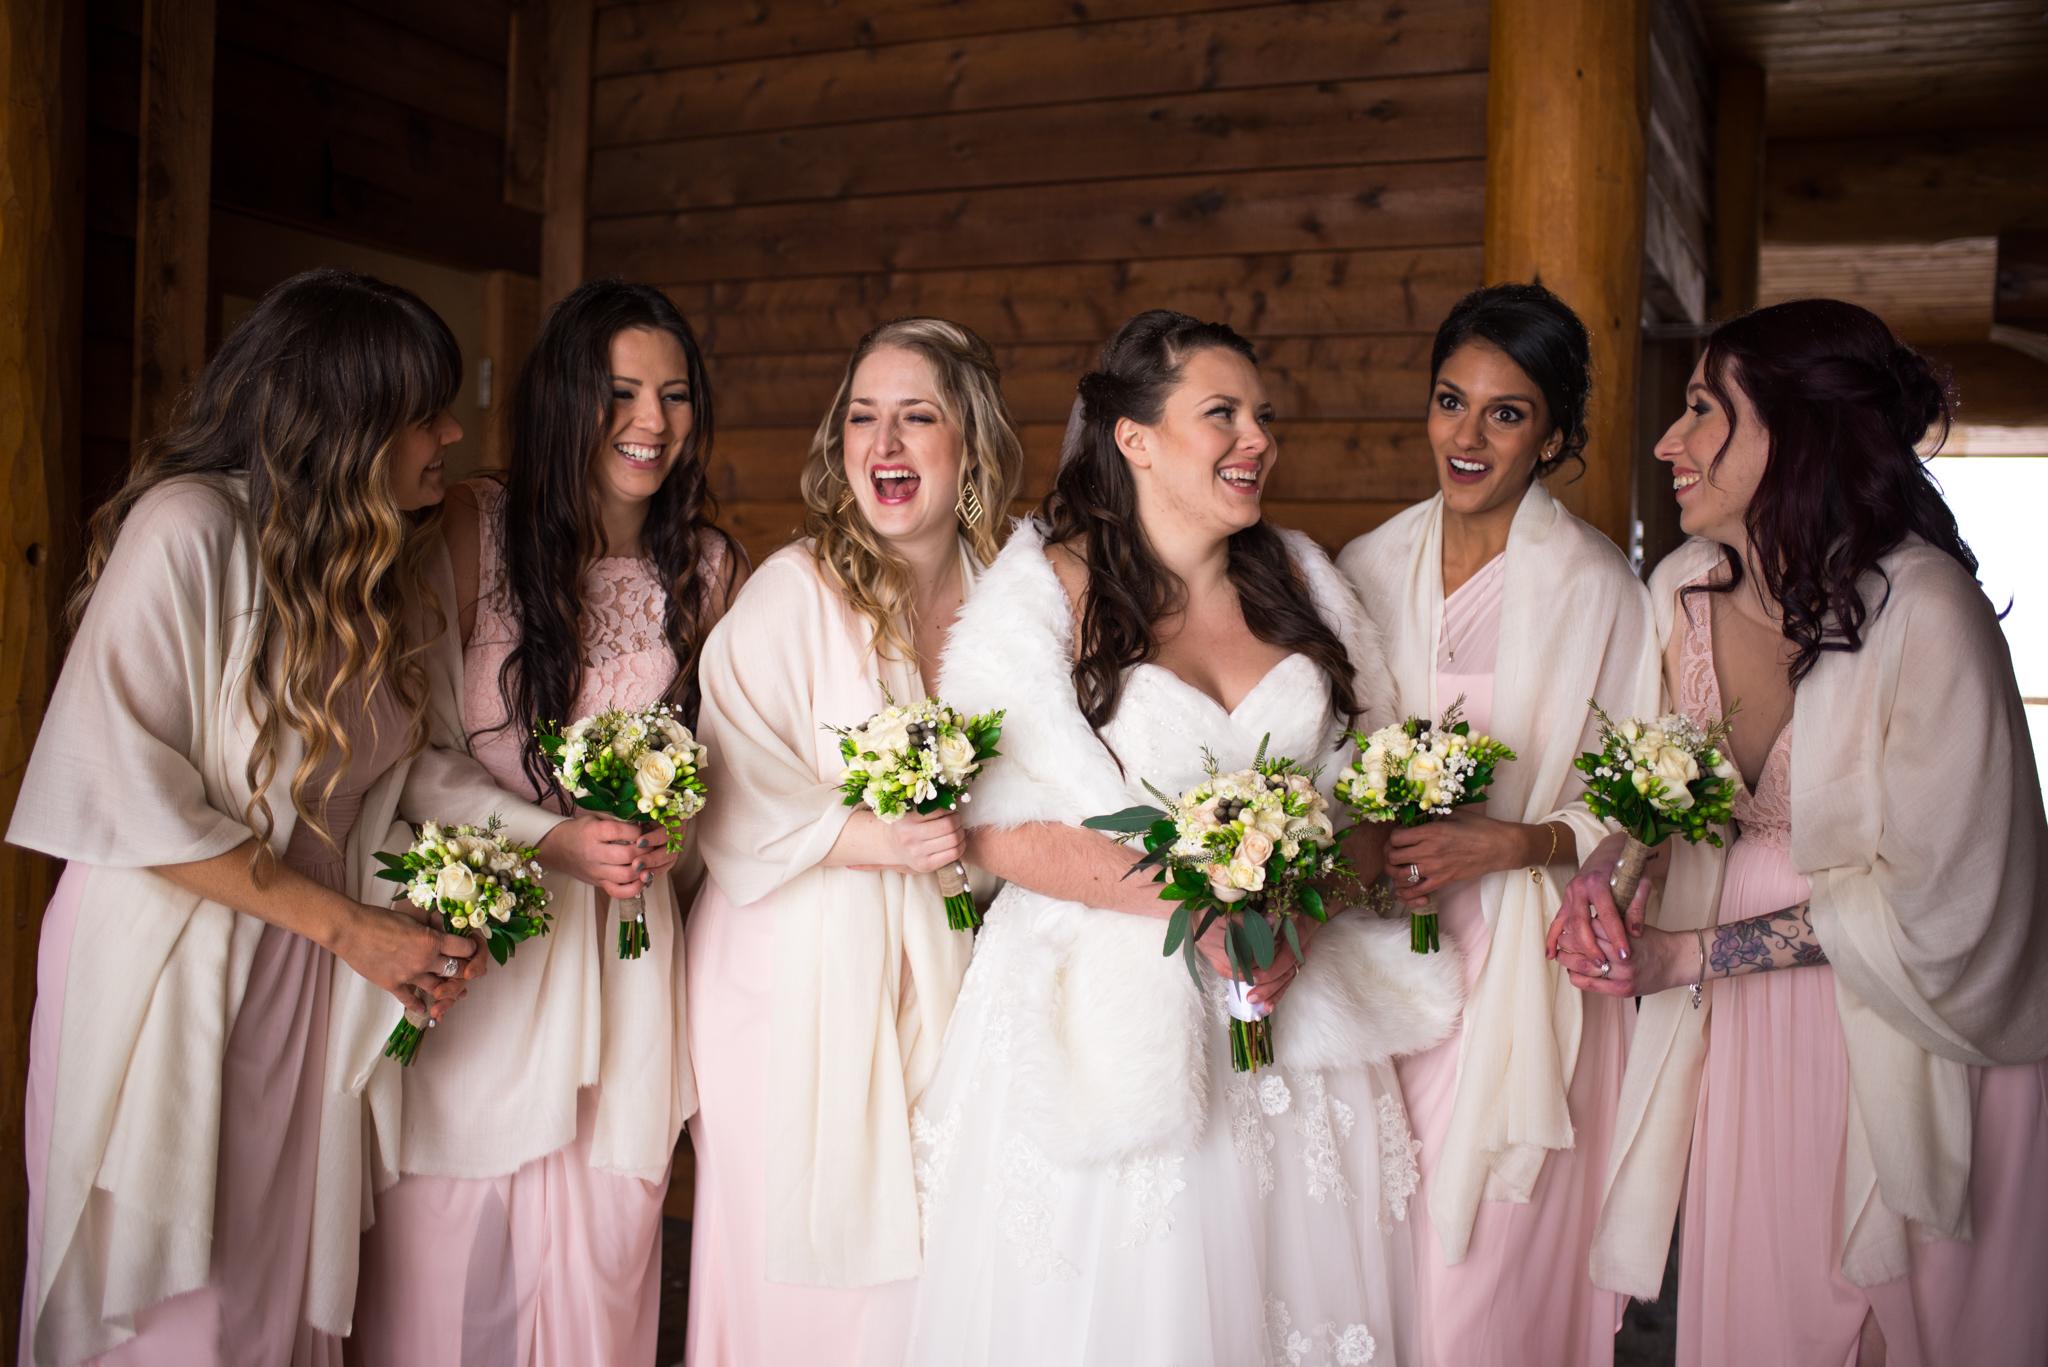 Fraser River Lodge Wedding 53.JPG